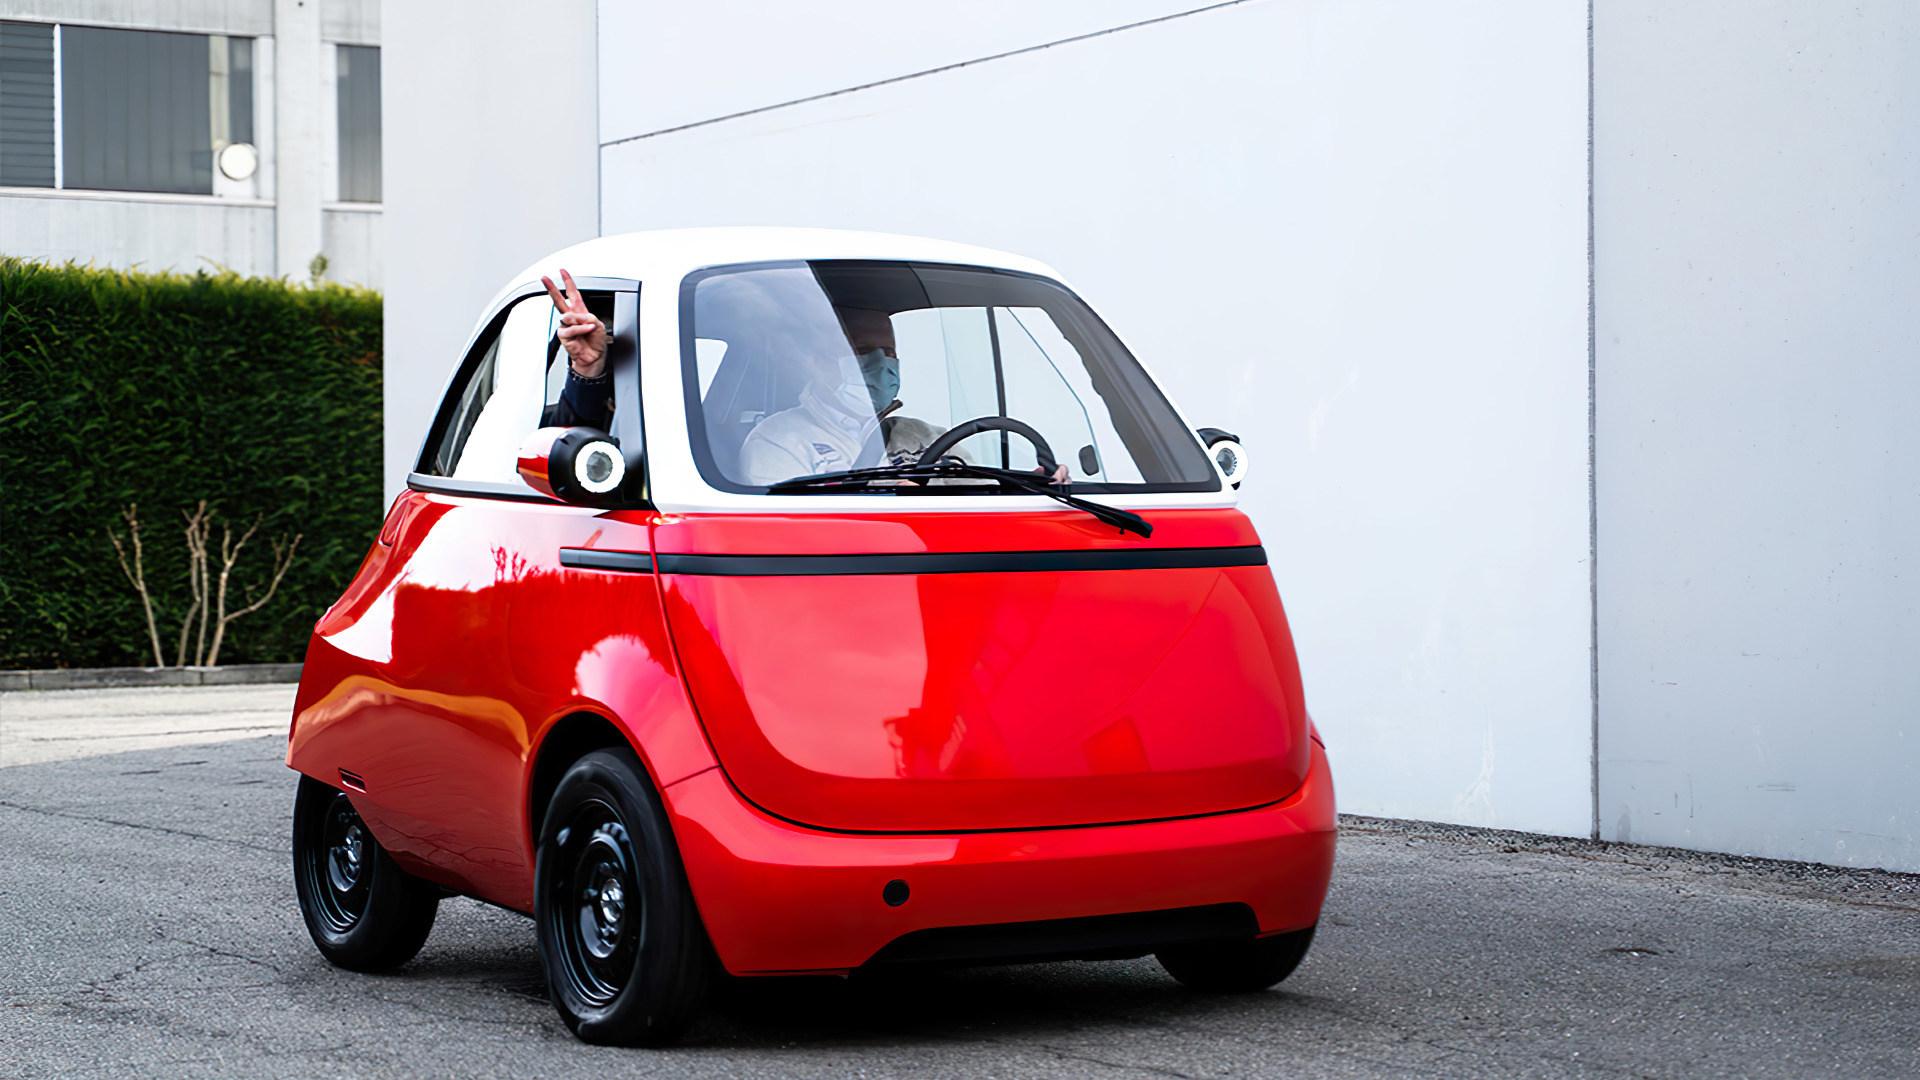 Elektromobilität, Prototyp, Elektroauto, Microlino, Knutschkugel